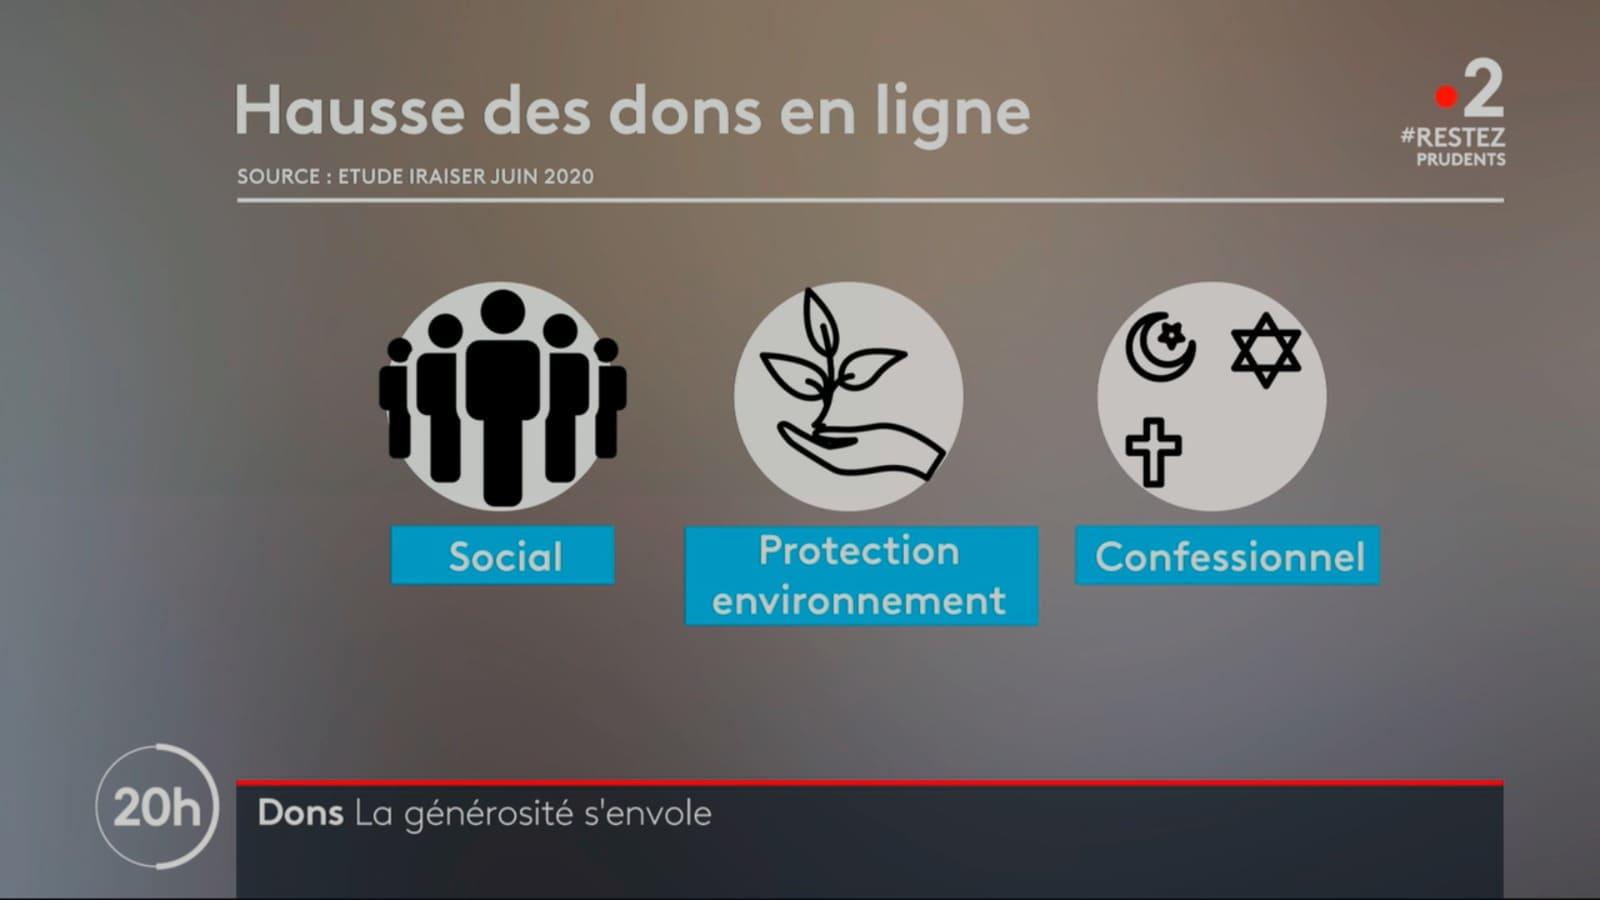 visuel JT France 2 RP etude iraiser don en ligne